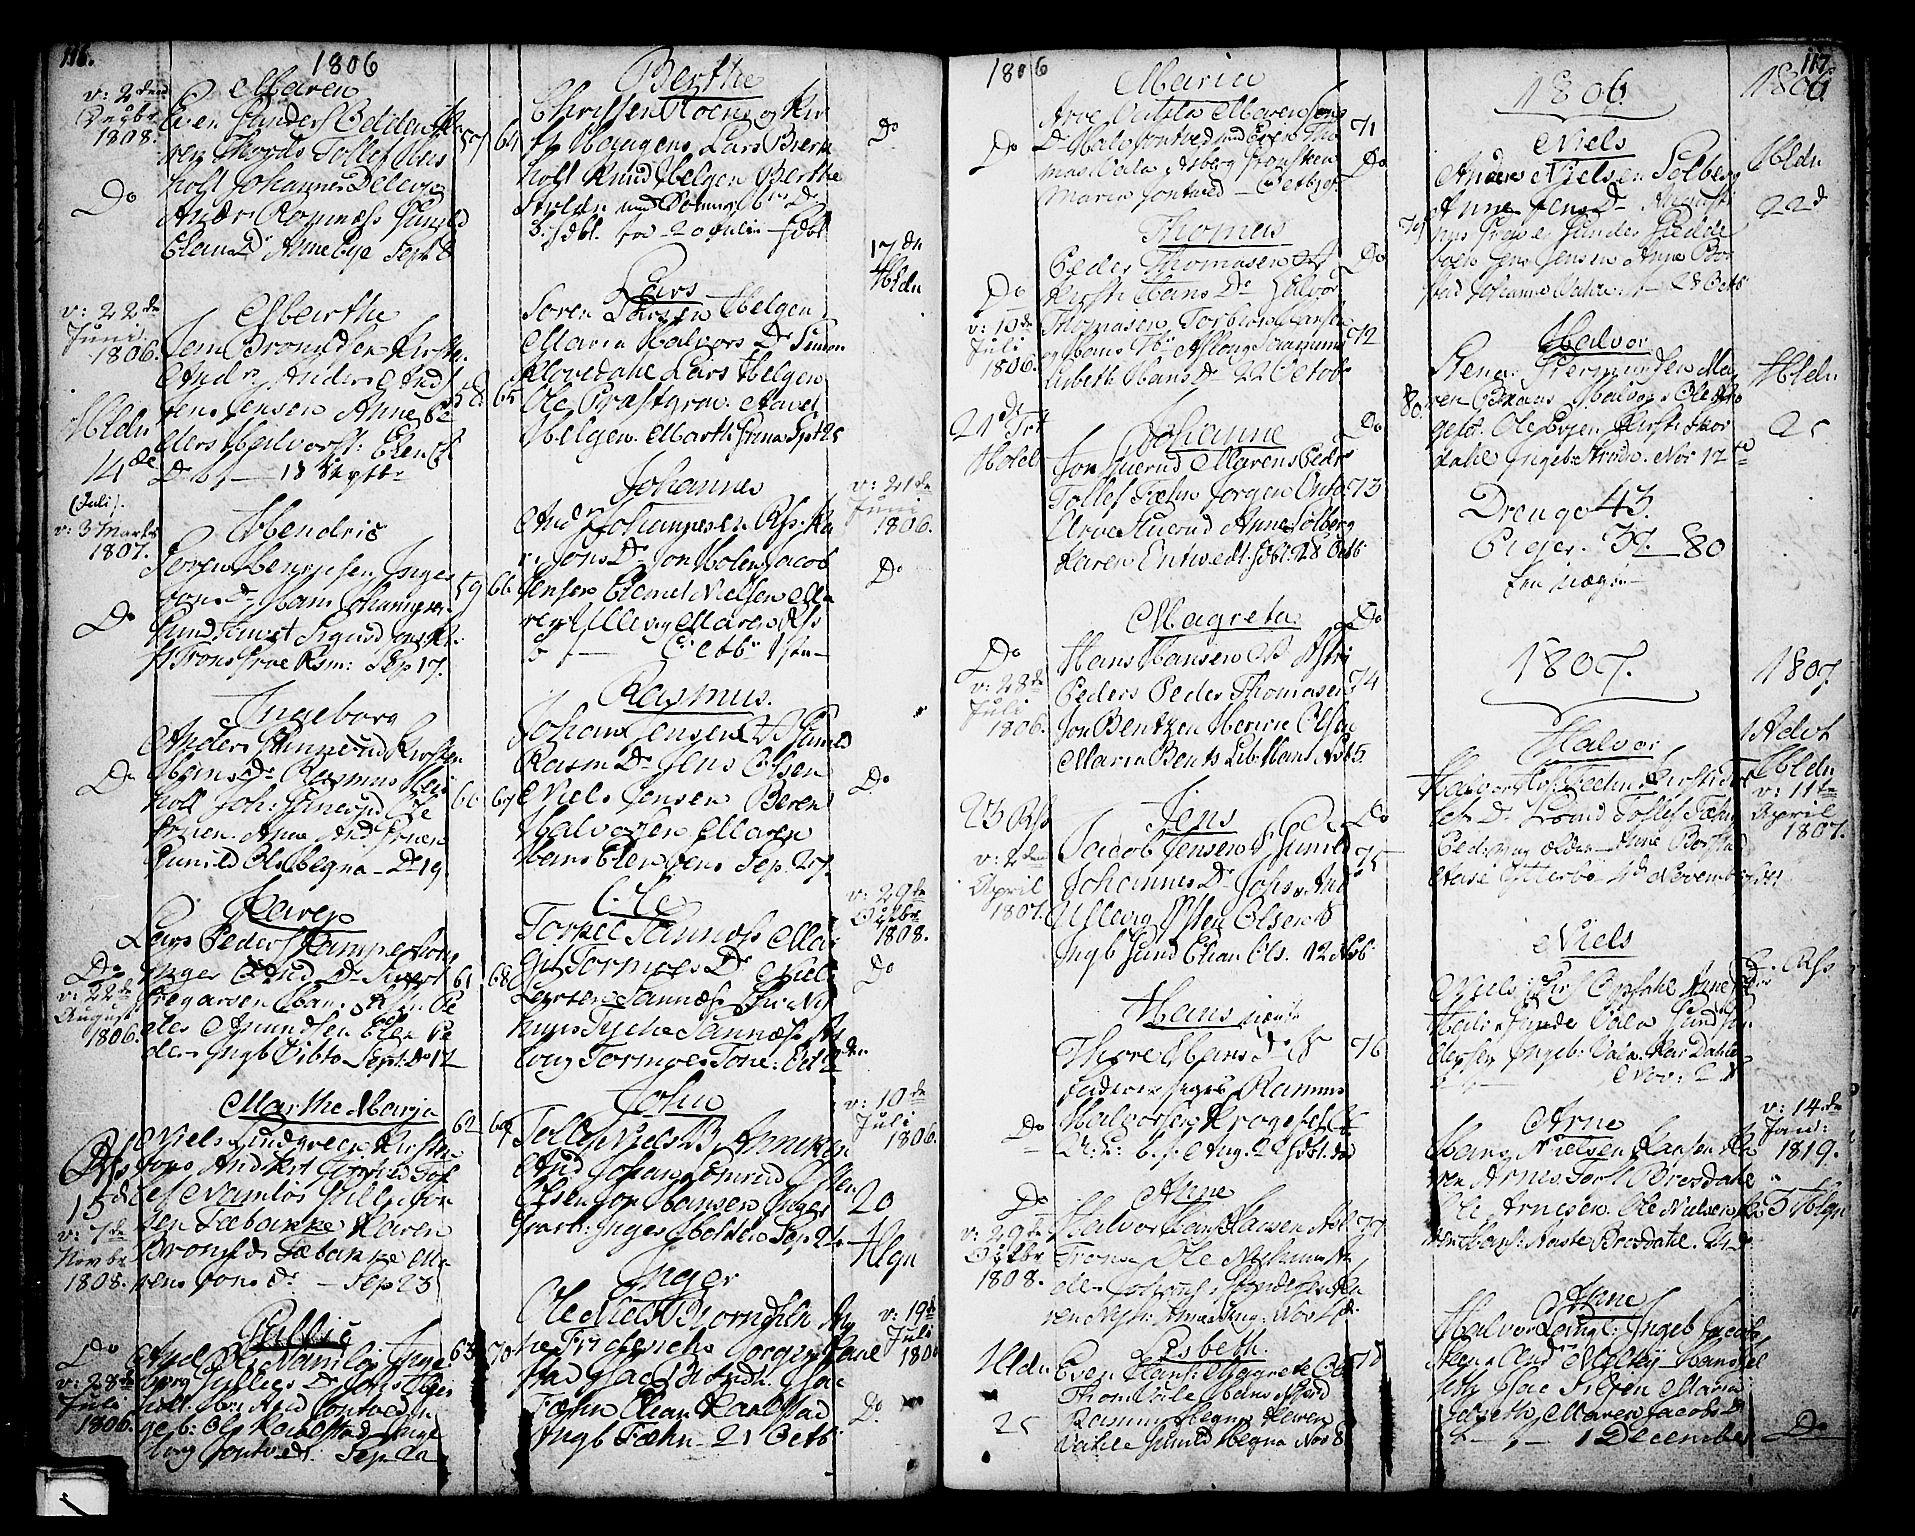 SAKO, Holla kirkebøker, F/Fa/L0002: Ministerialbok nr. 2, 1779-1814, s. 116-117